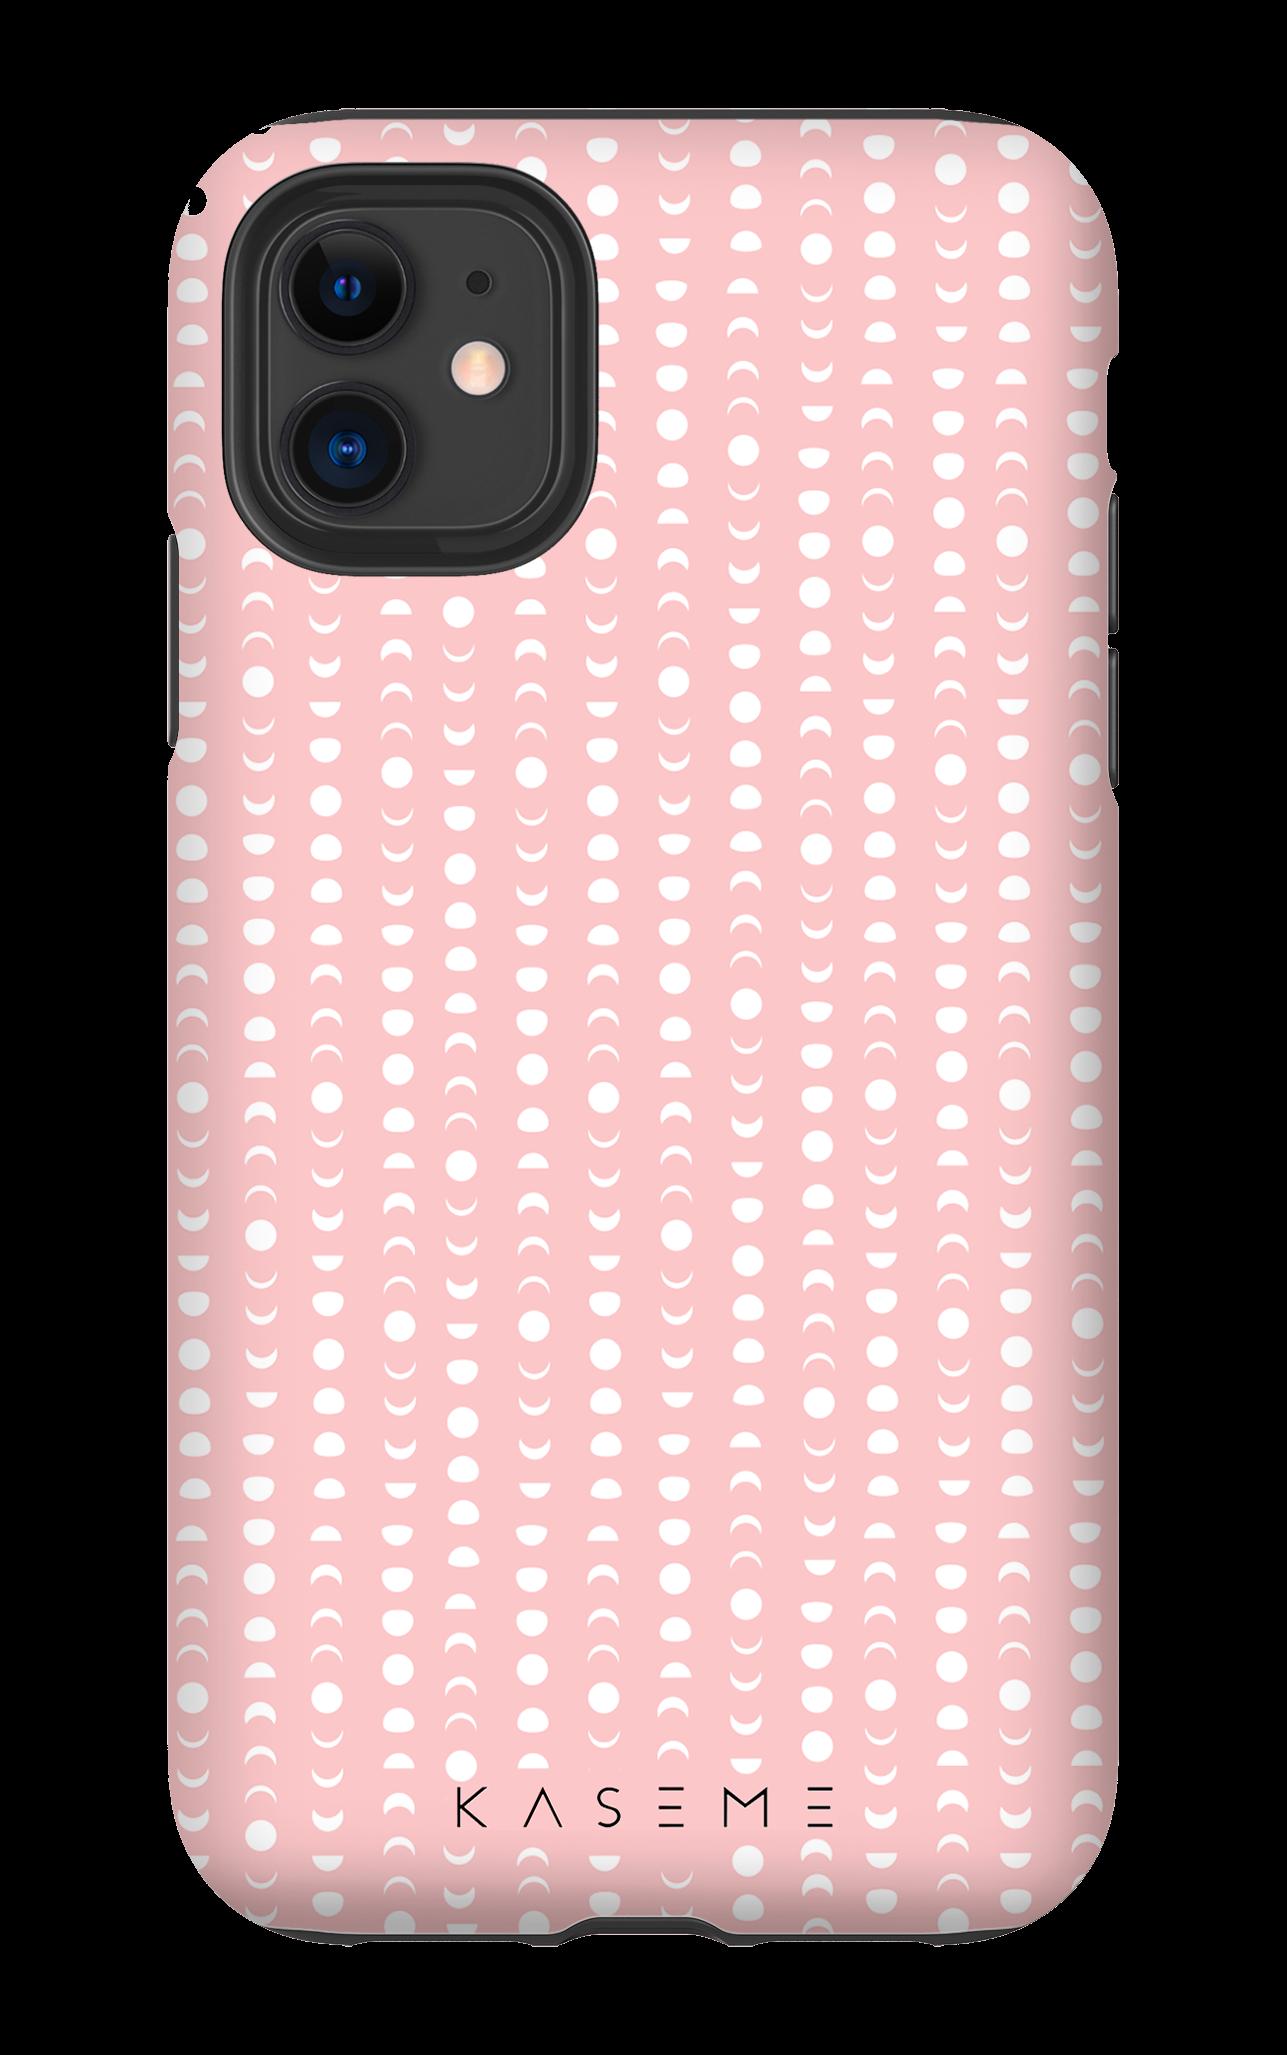 Lunar phone case